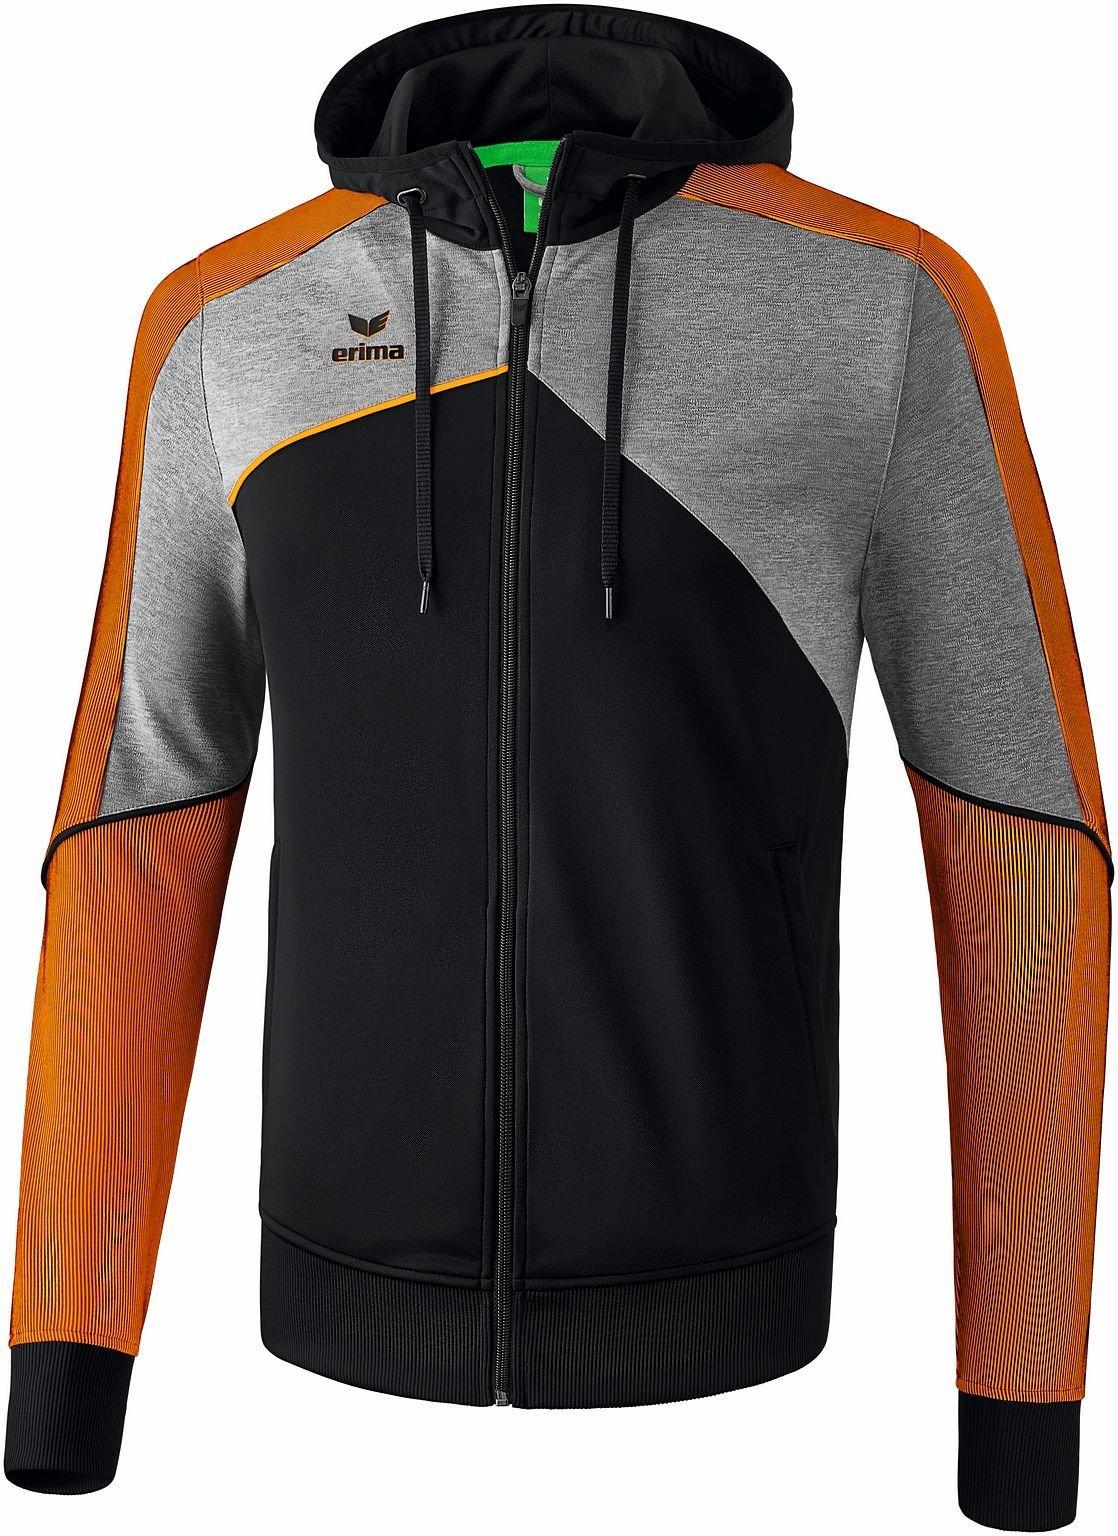 Premium One 2.0 Trainingsjacke mit Kapuze ak1071807